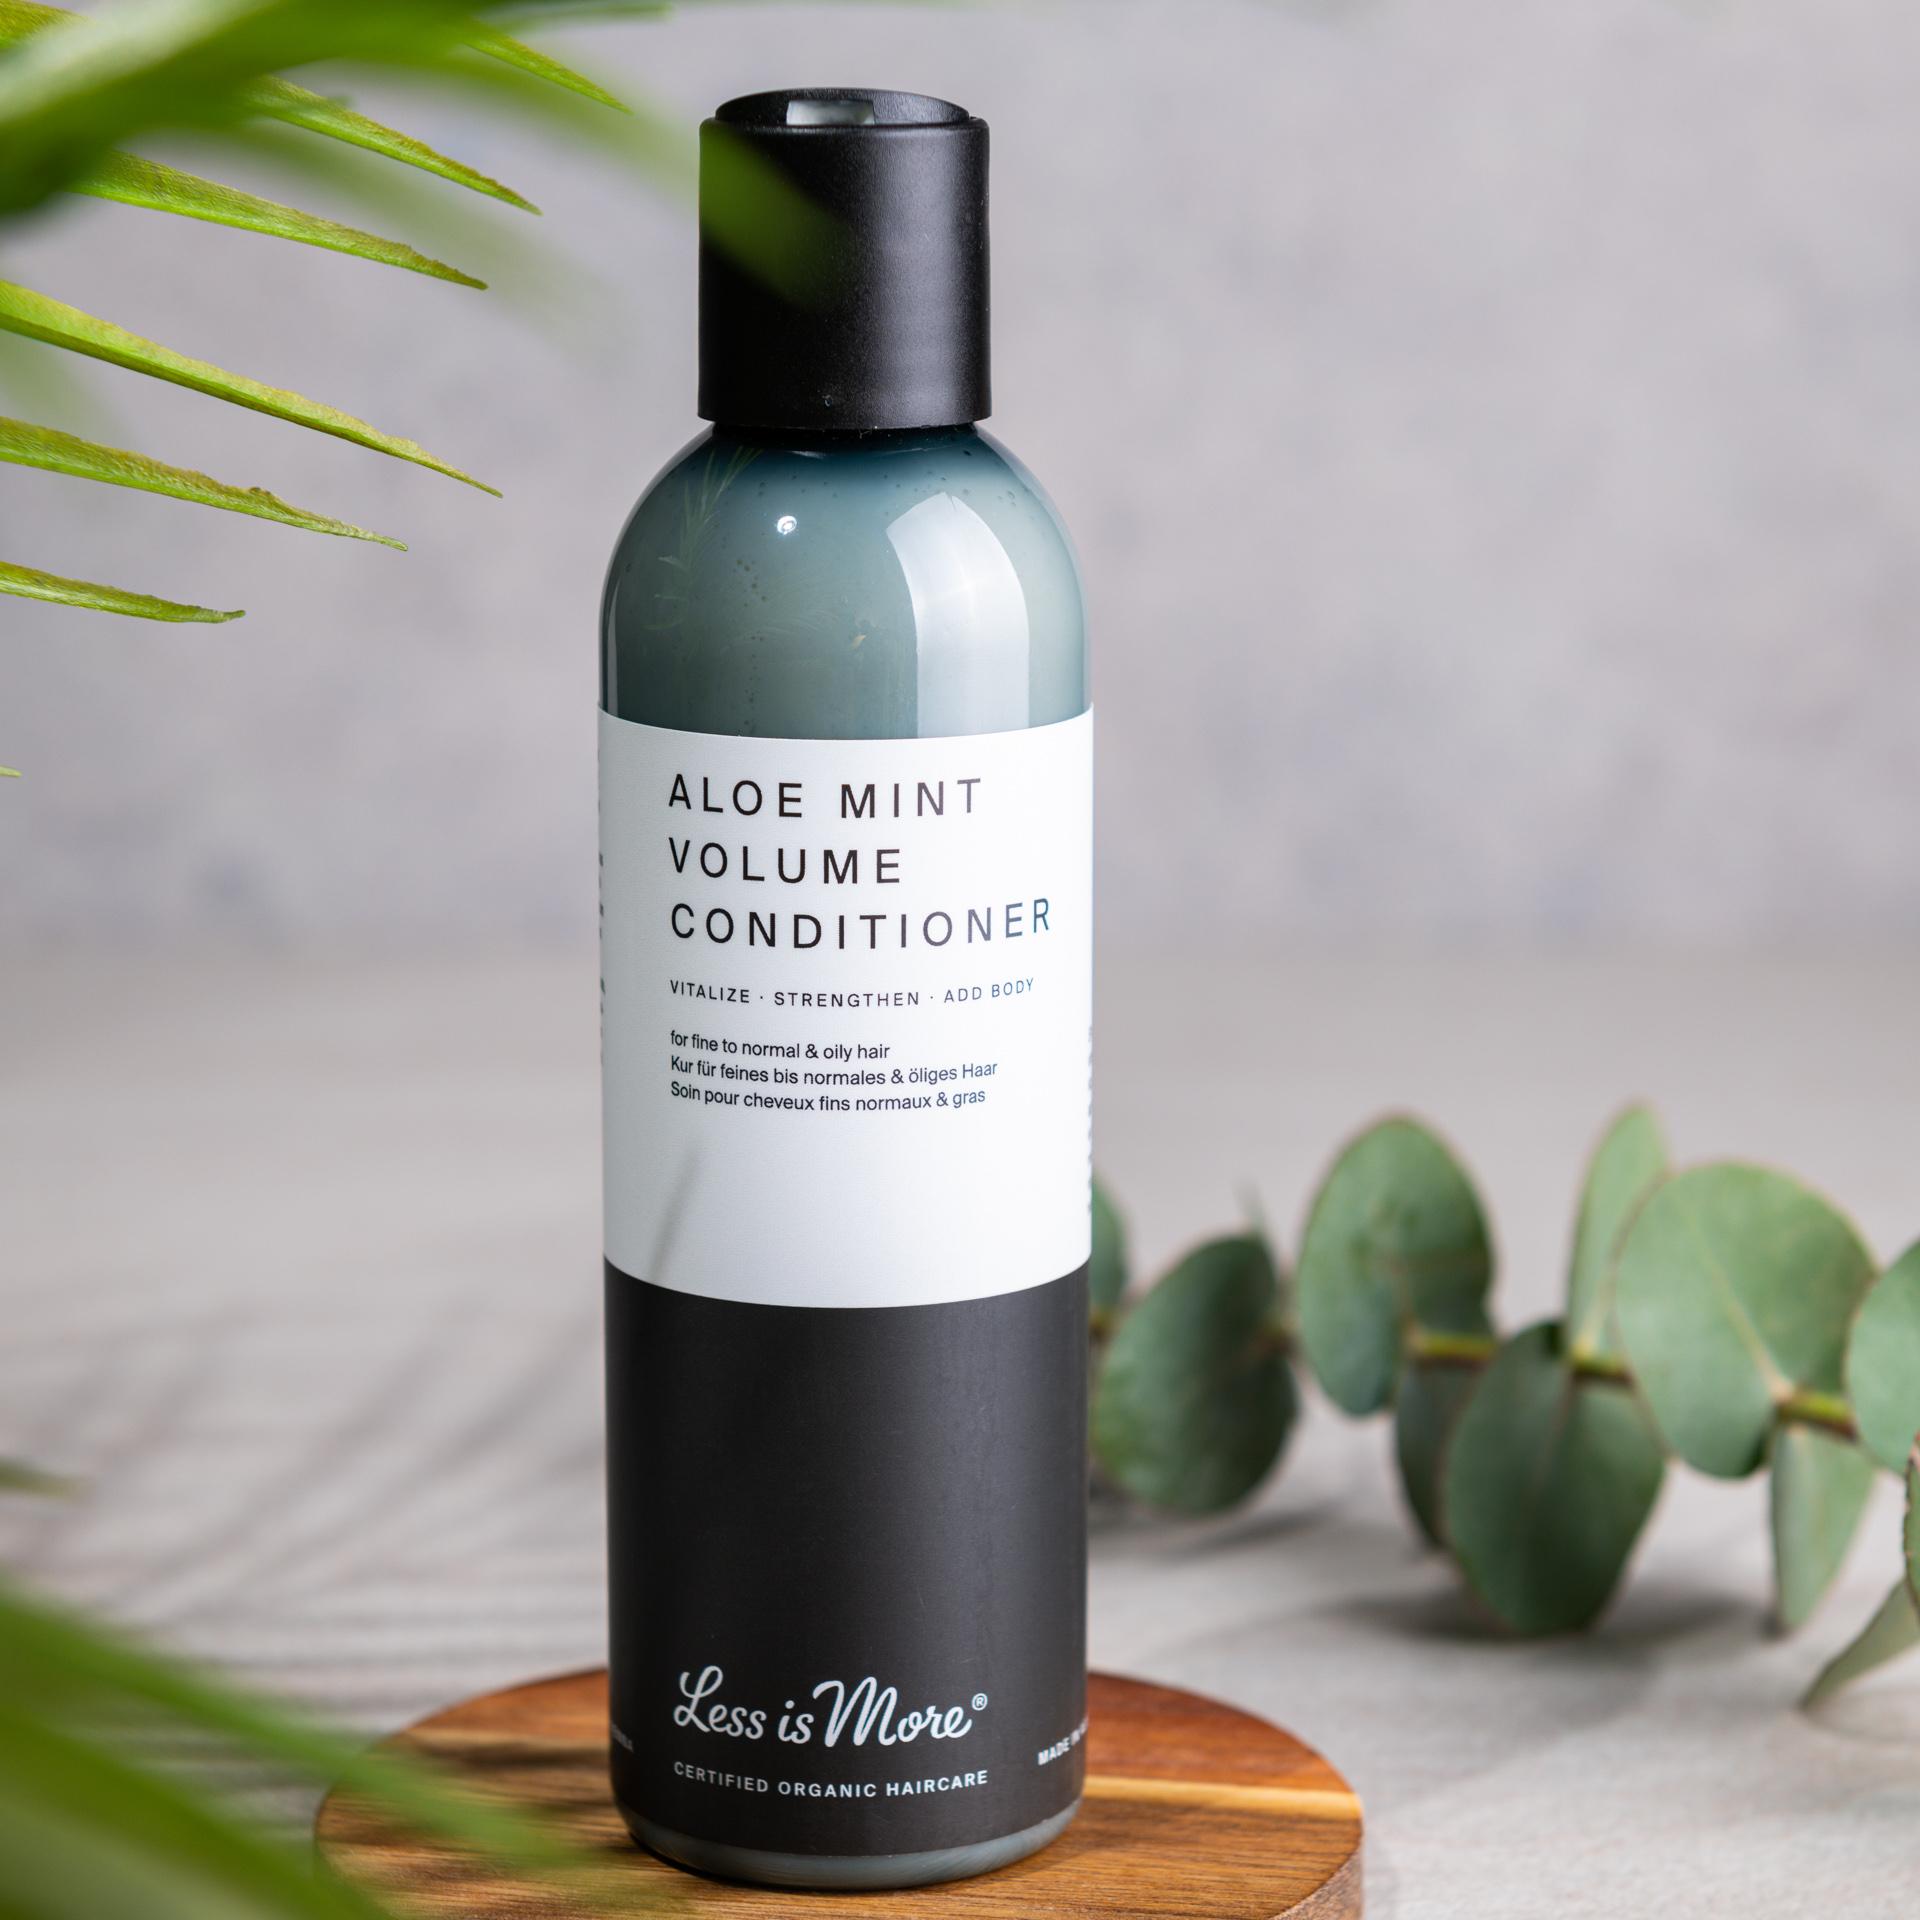 Aloe Mint Volume Conditioner